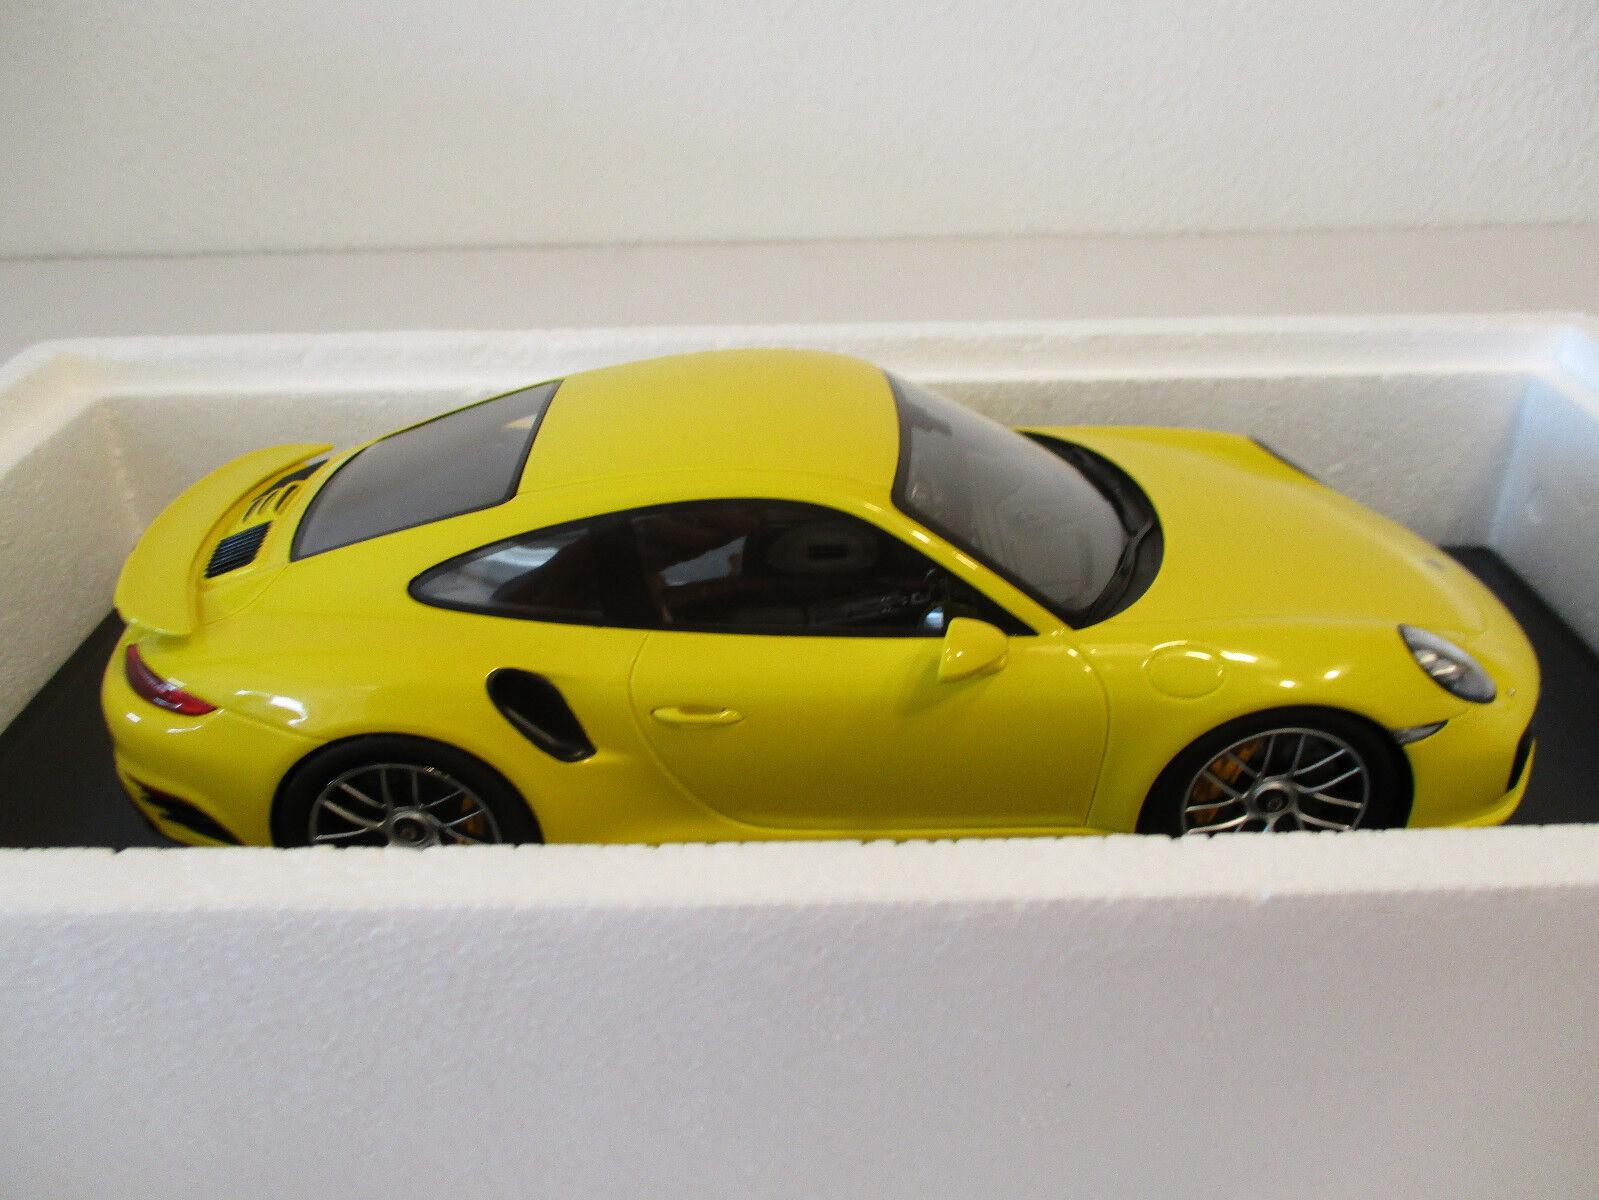 (Modelage) 1 18 18 18 Spark Porsche 911 Turbo S Racing jaune Neuf neuf dans sa boîte e17c70